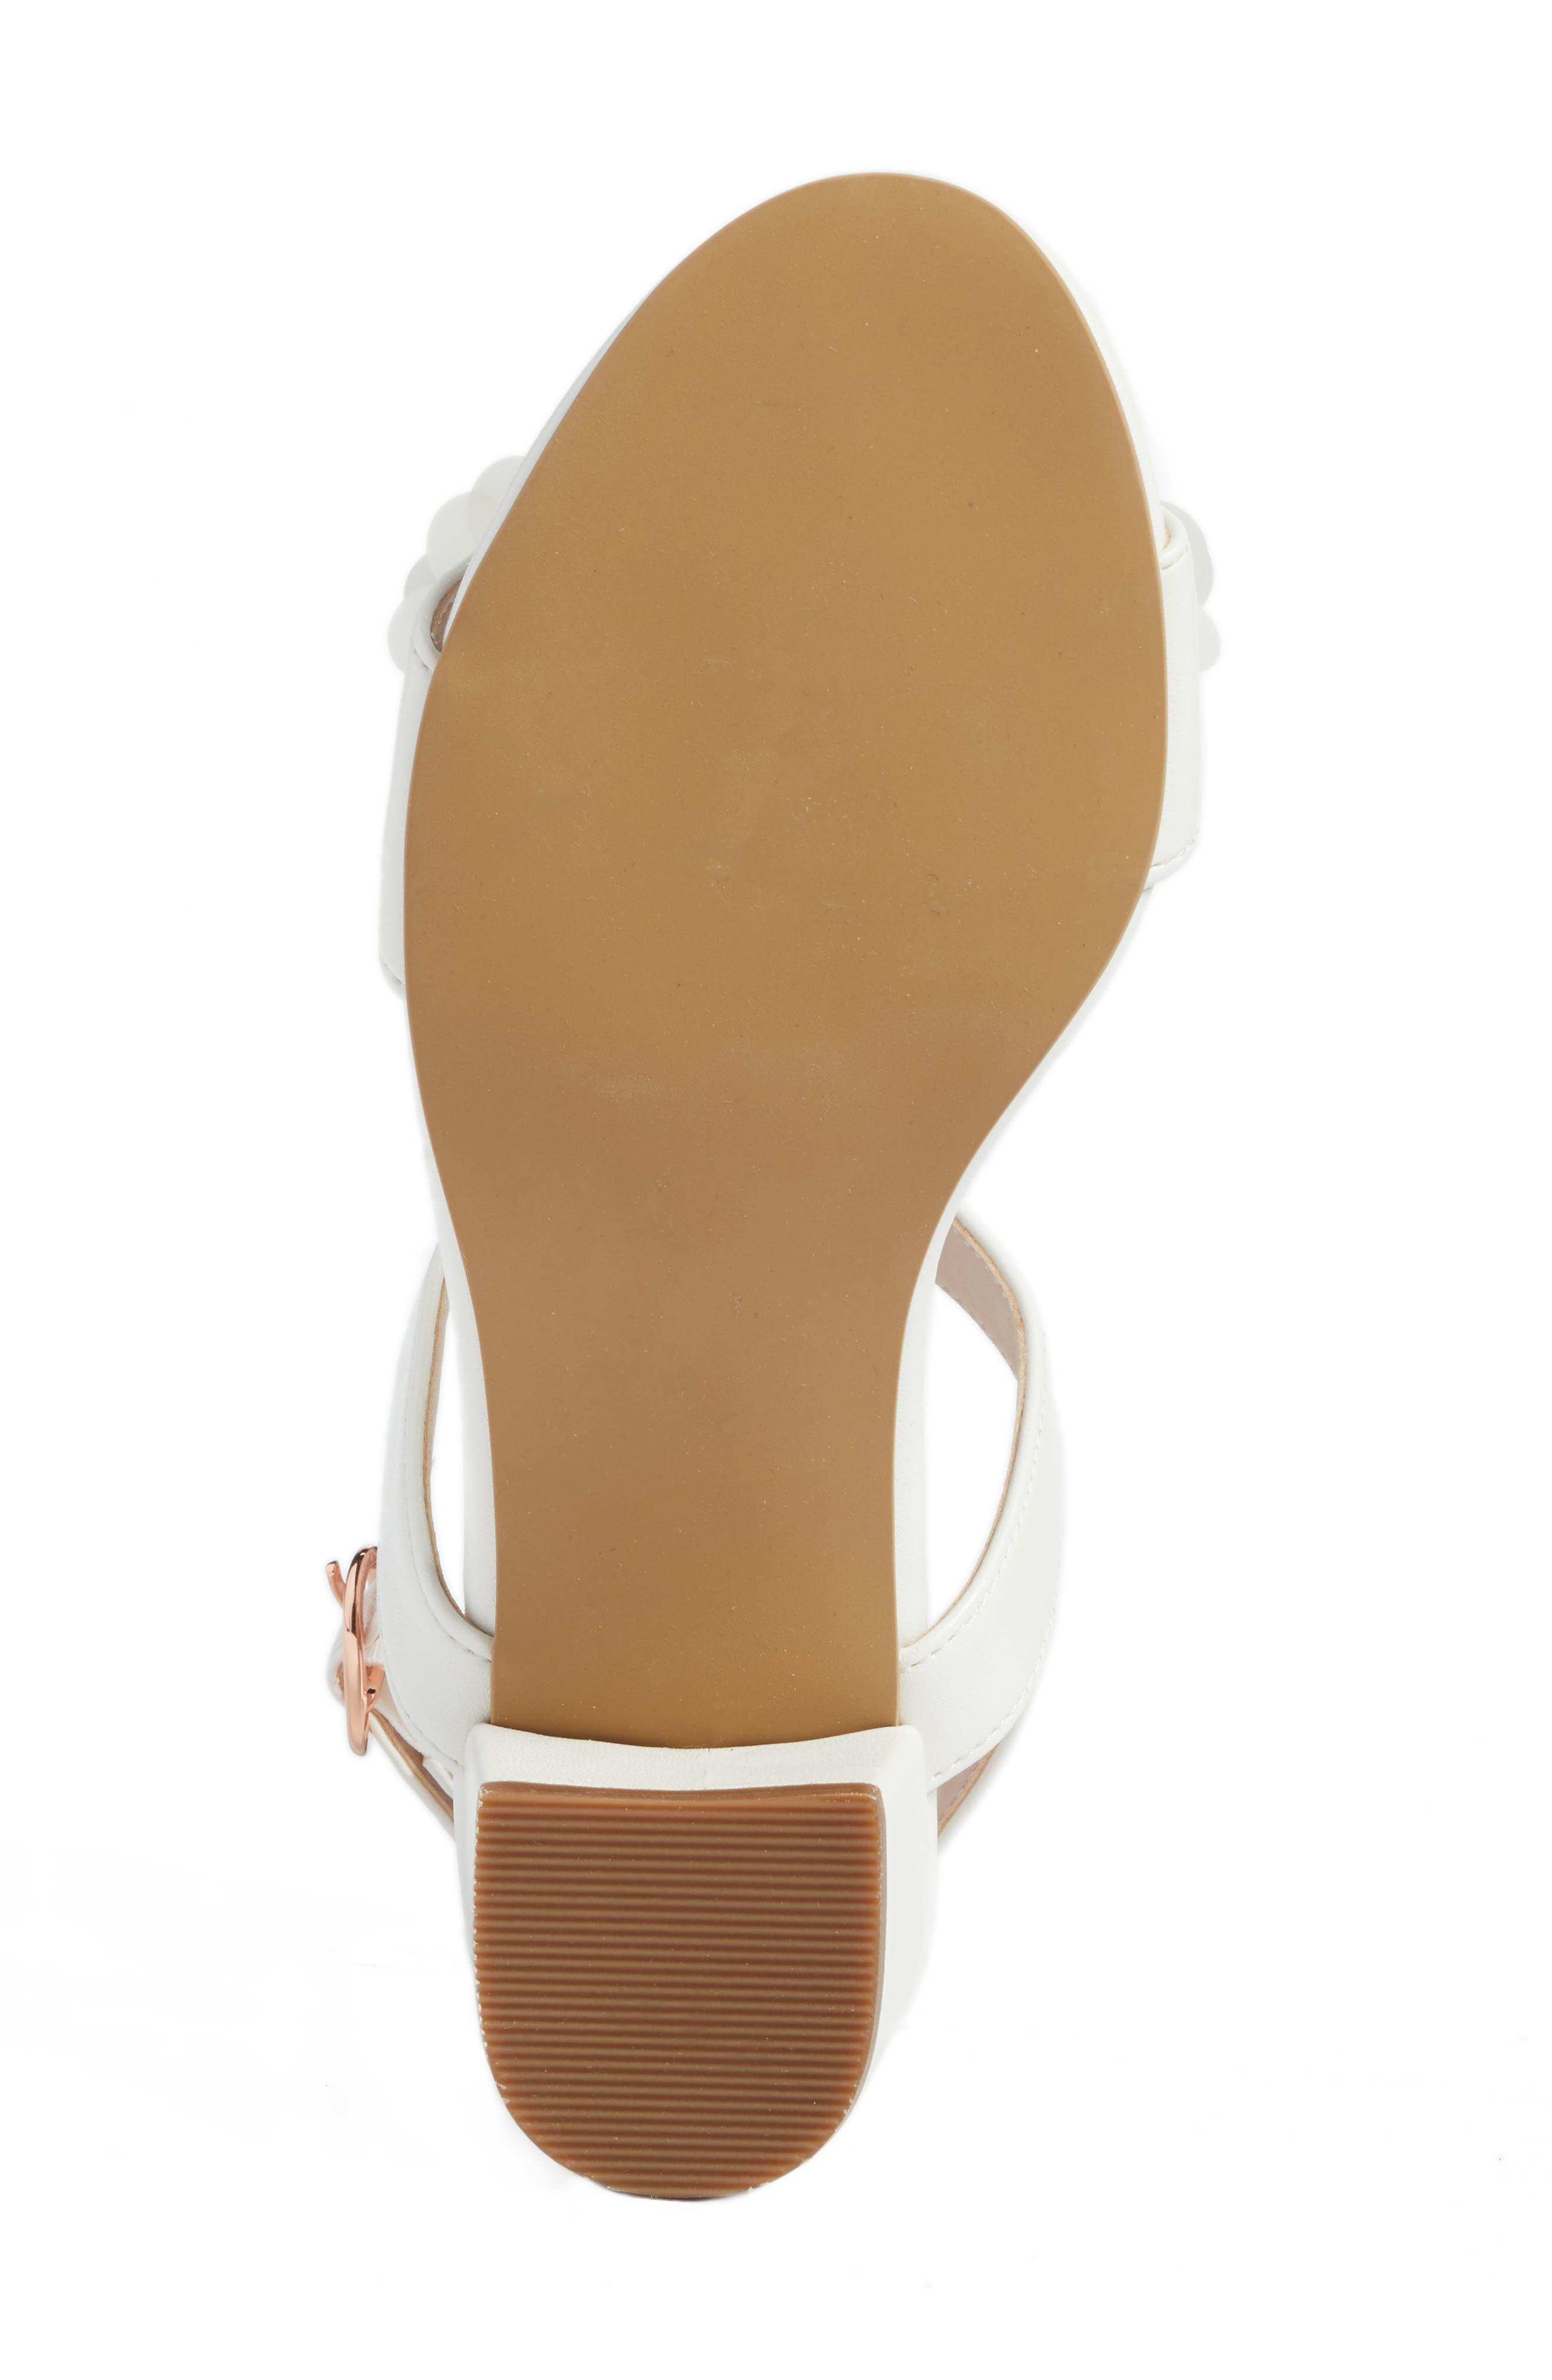 Dina Flowered Sandal,                             Alternate thumbnail 6, color,                             White Faux Leather